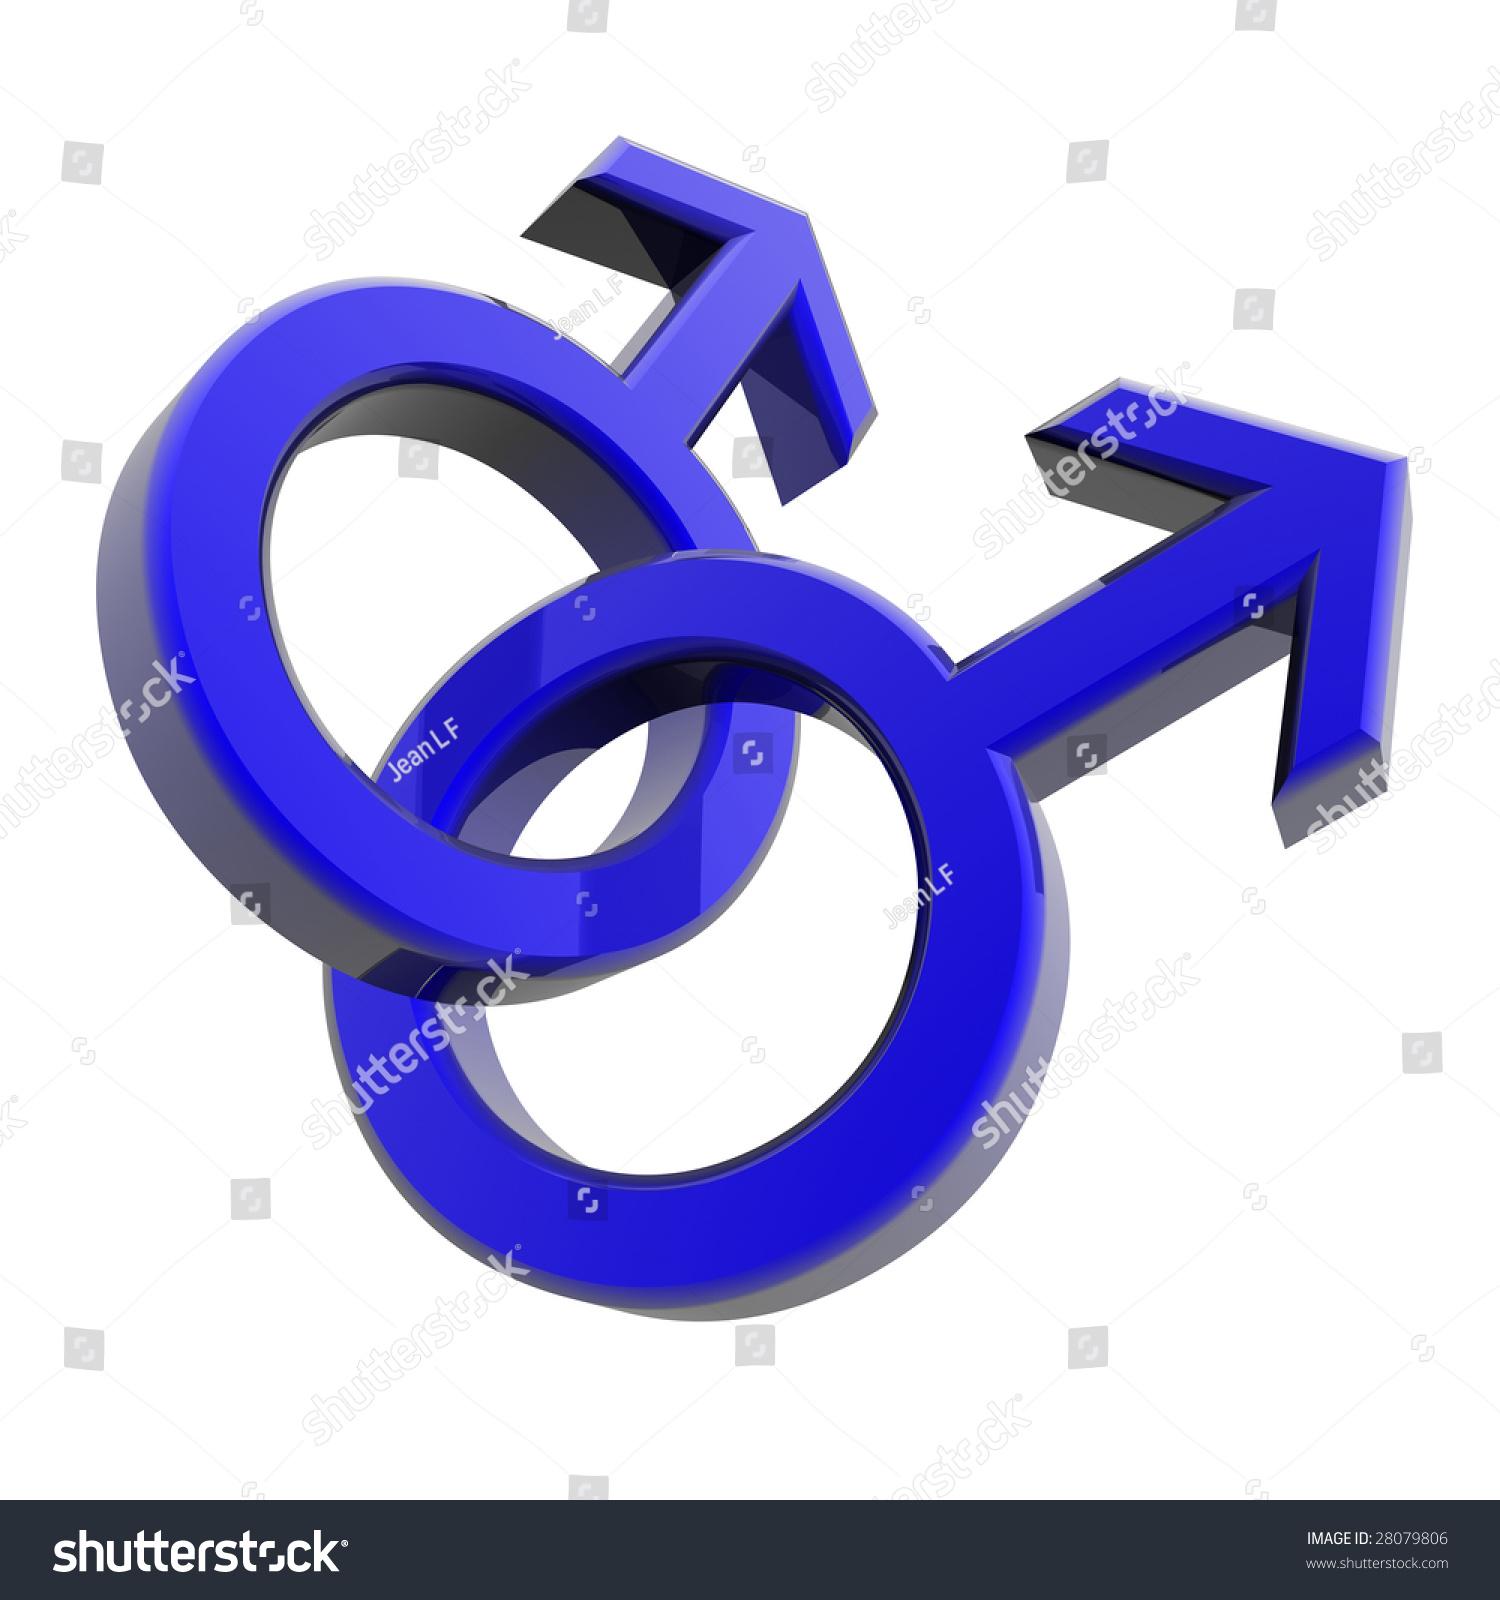 Double male symbol represents Gay men